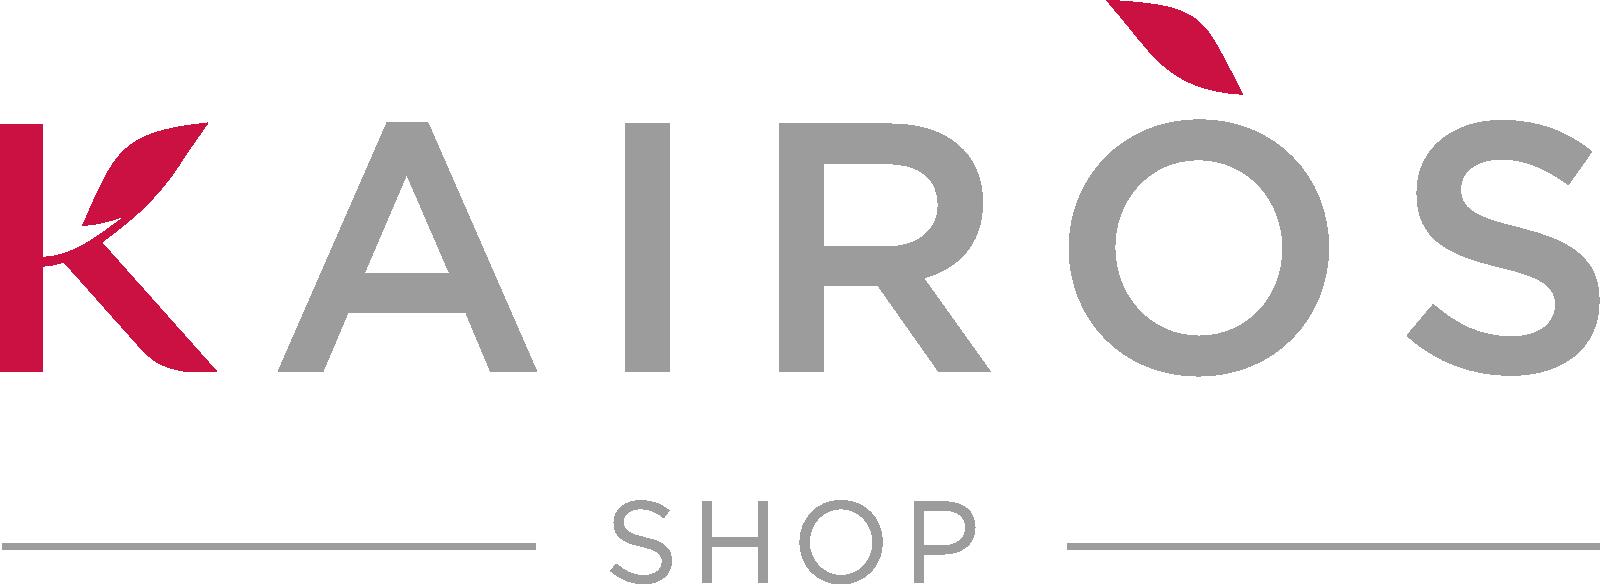 Kairos-shop